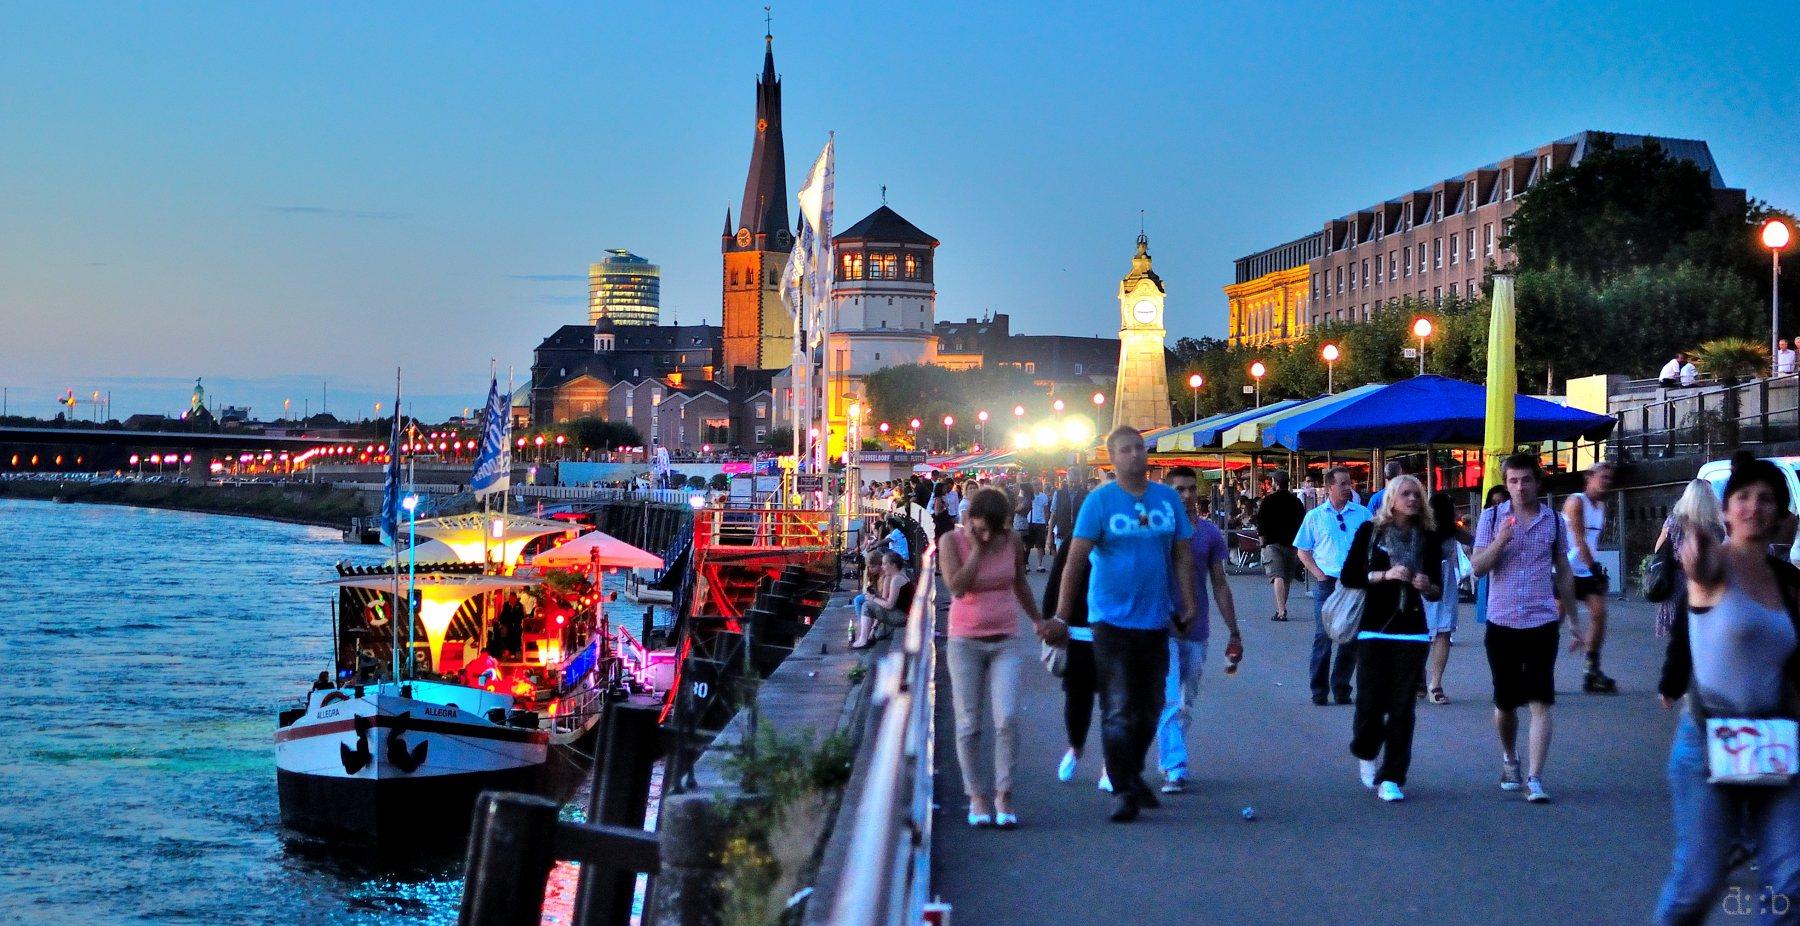 A typical summer night at Düsseldorf's Rhine promenade.